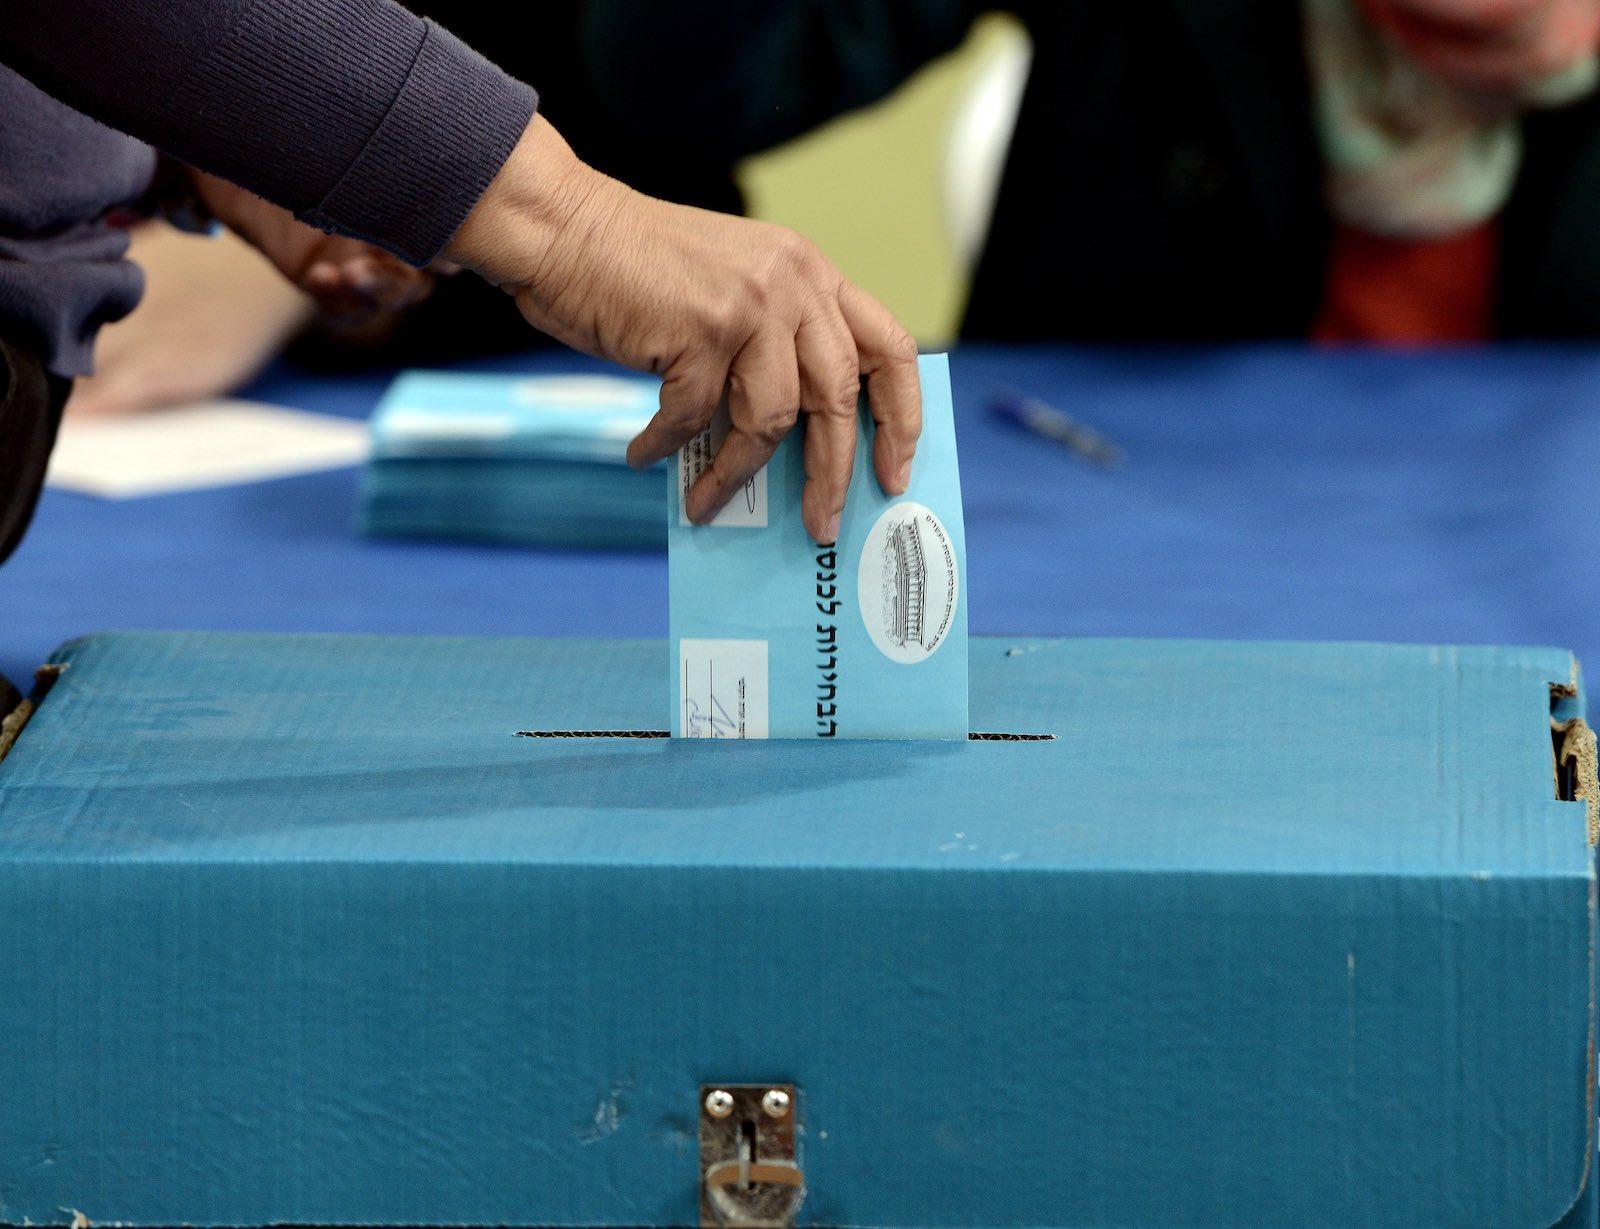 Will Israeli voters buck the trend of distrust for the status quo? (Photo: Salih Zeki Fazlioglu via Getty)